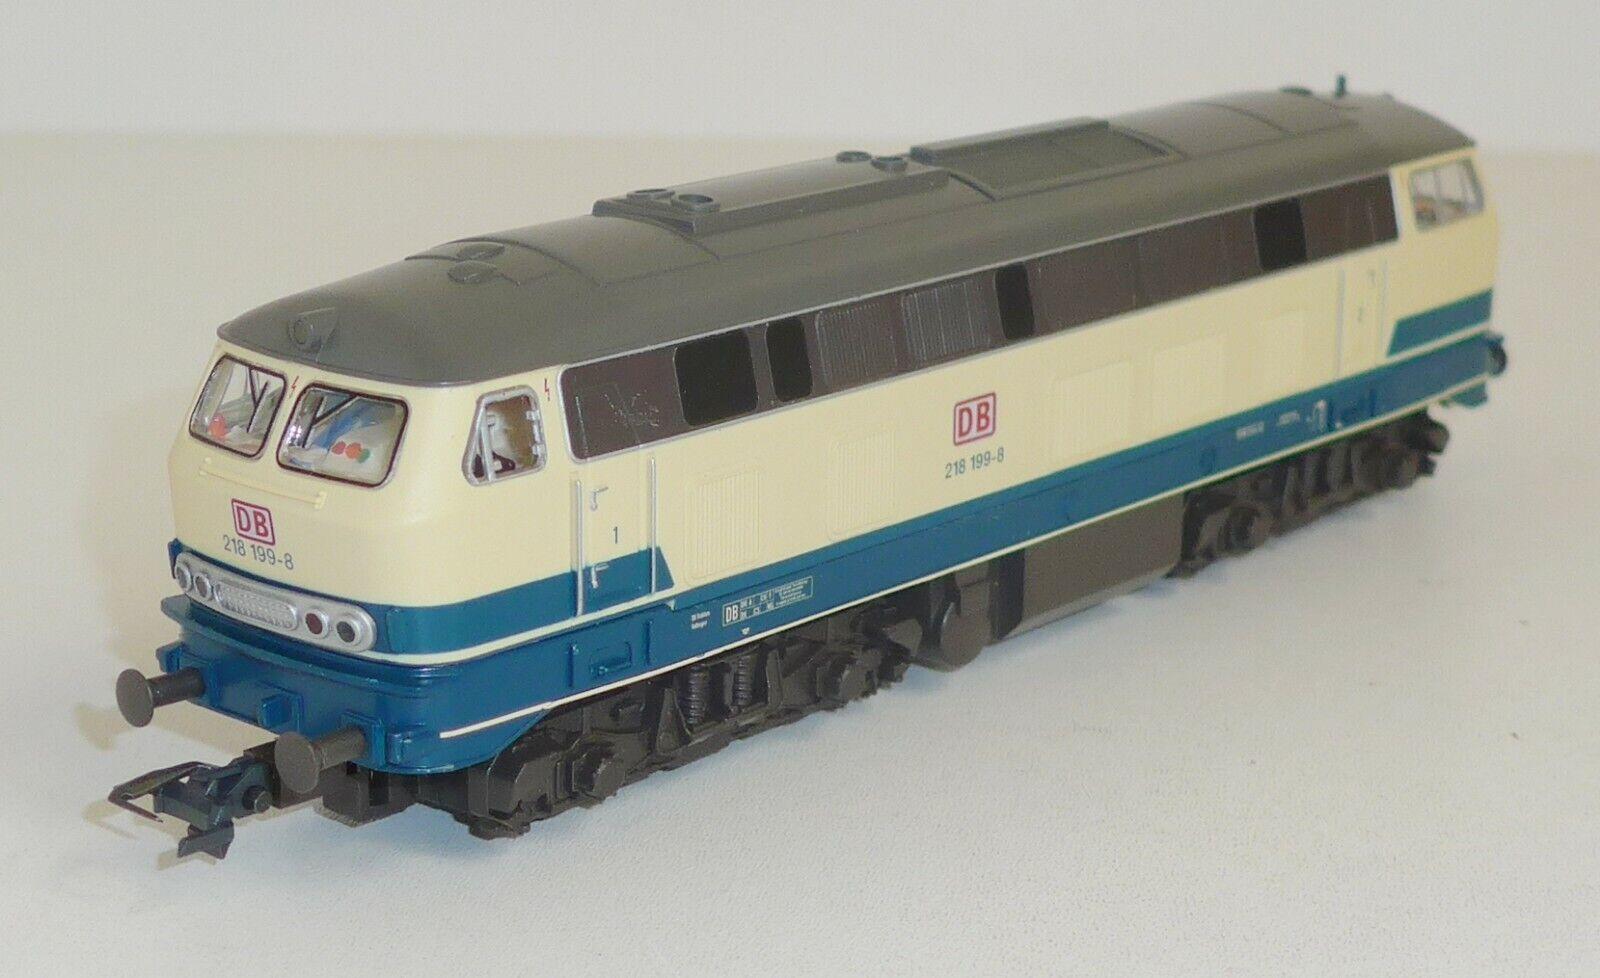 Piko hobby 57517 DB diesellok br 218 199-8 Lenz digital OVP h0